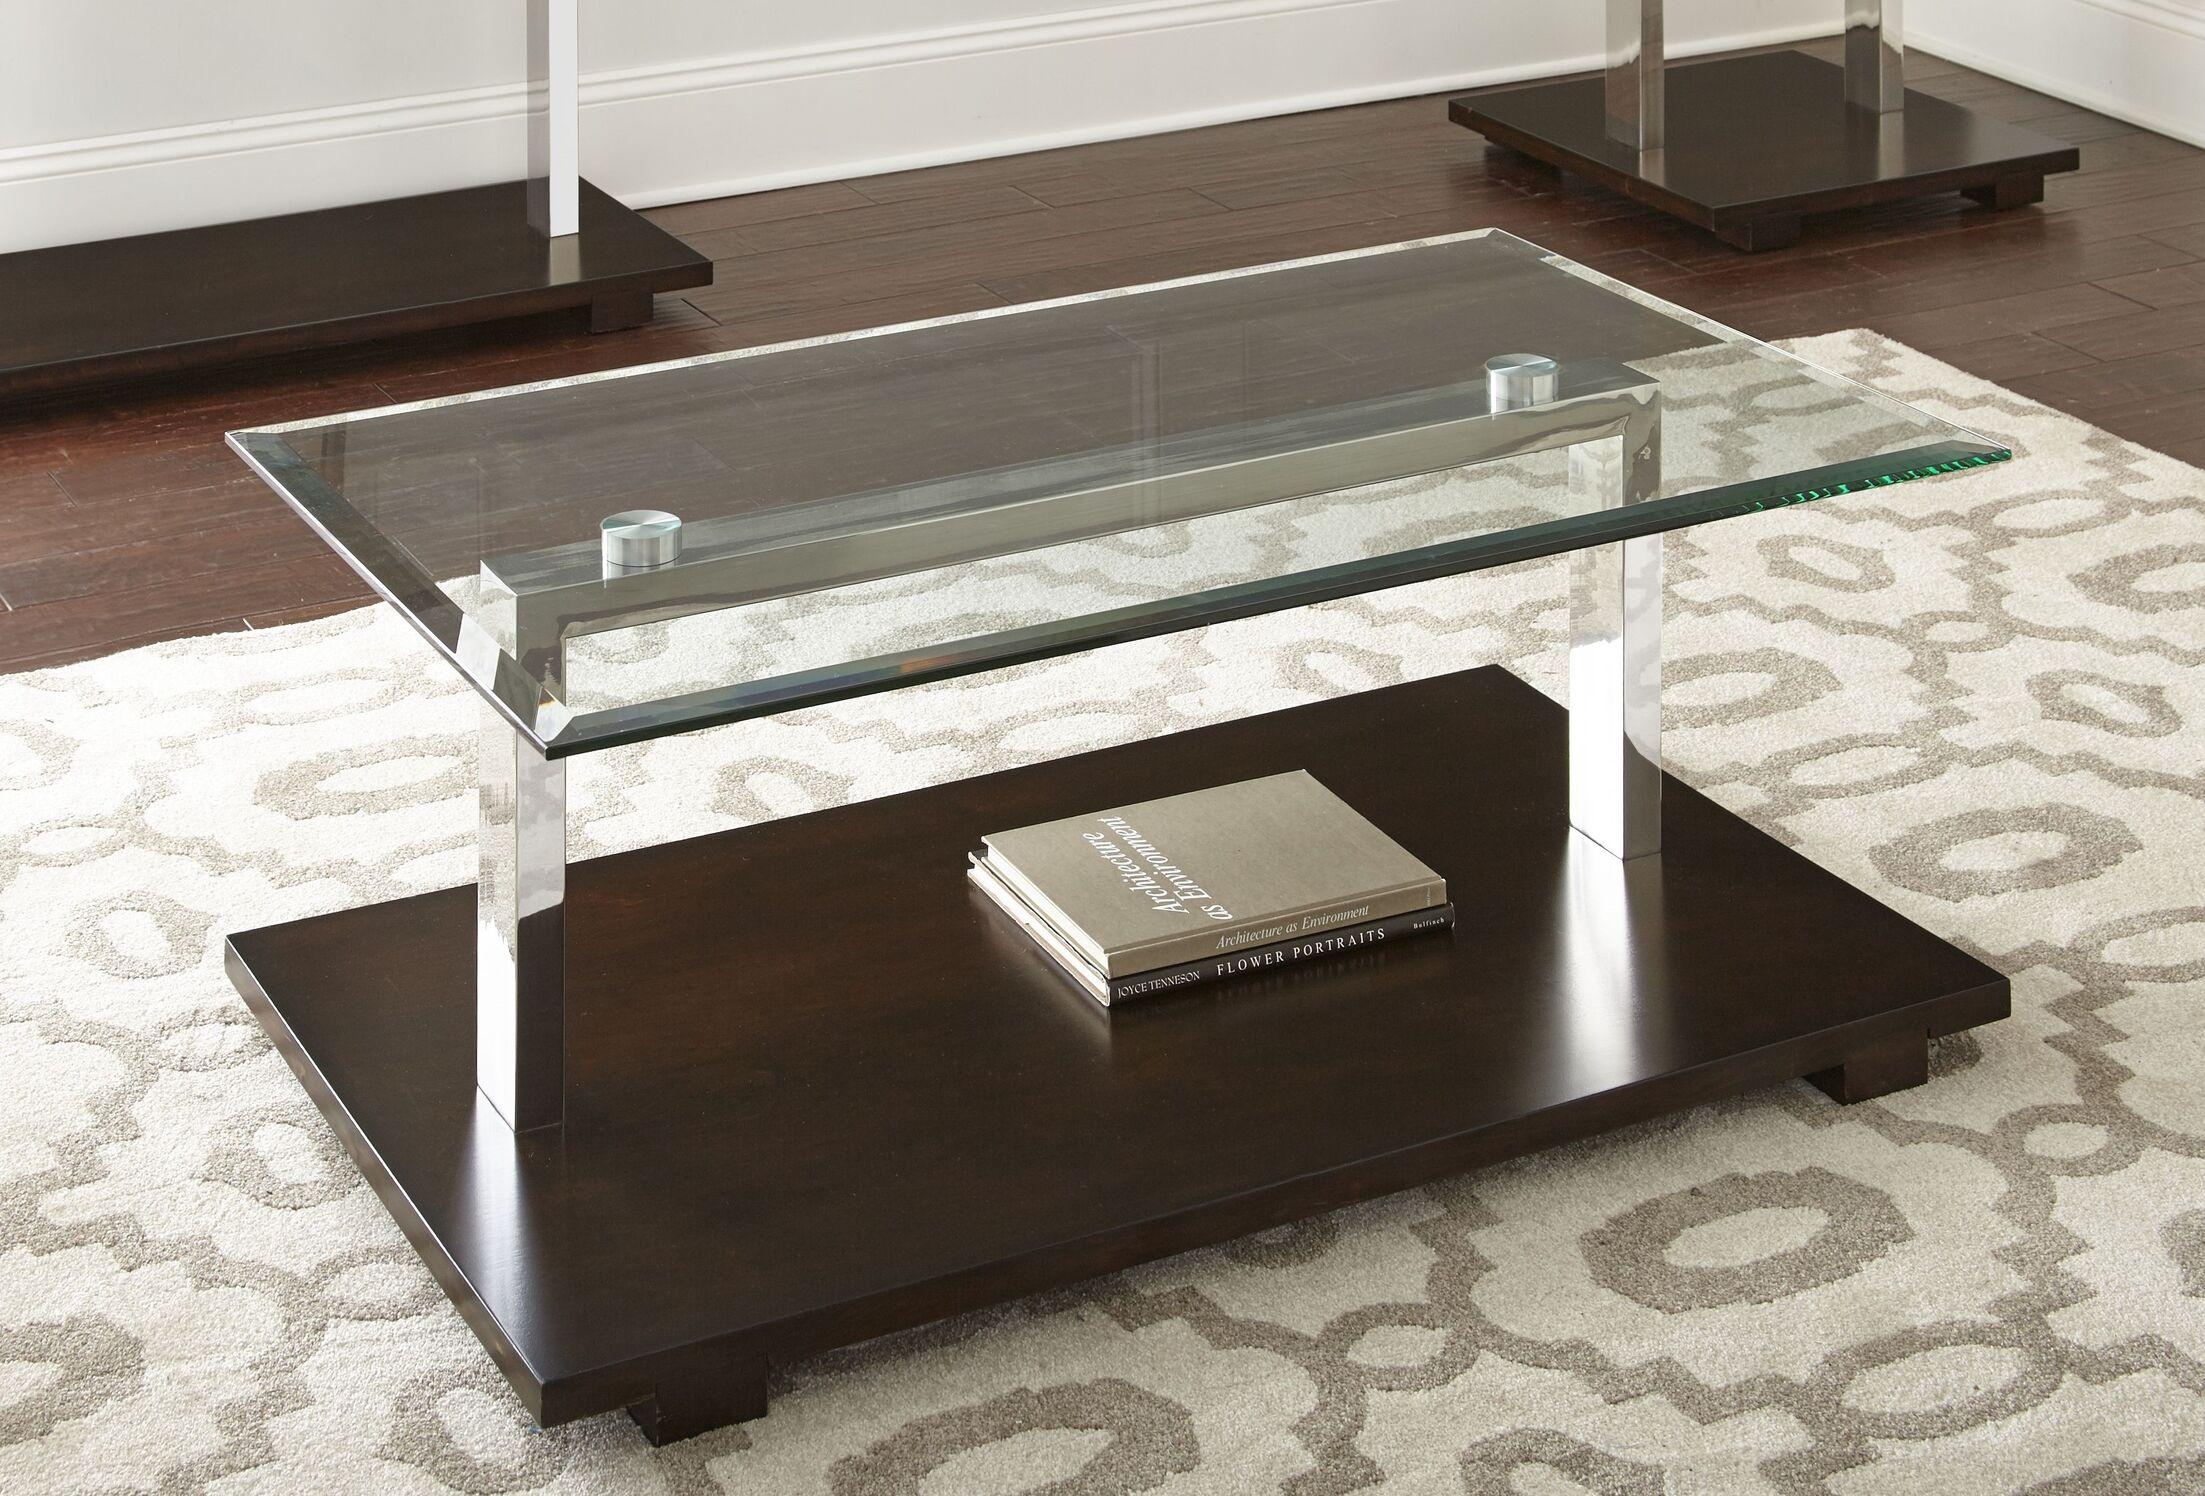 RJ Coffee Table